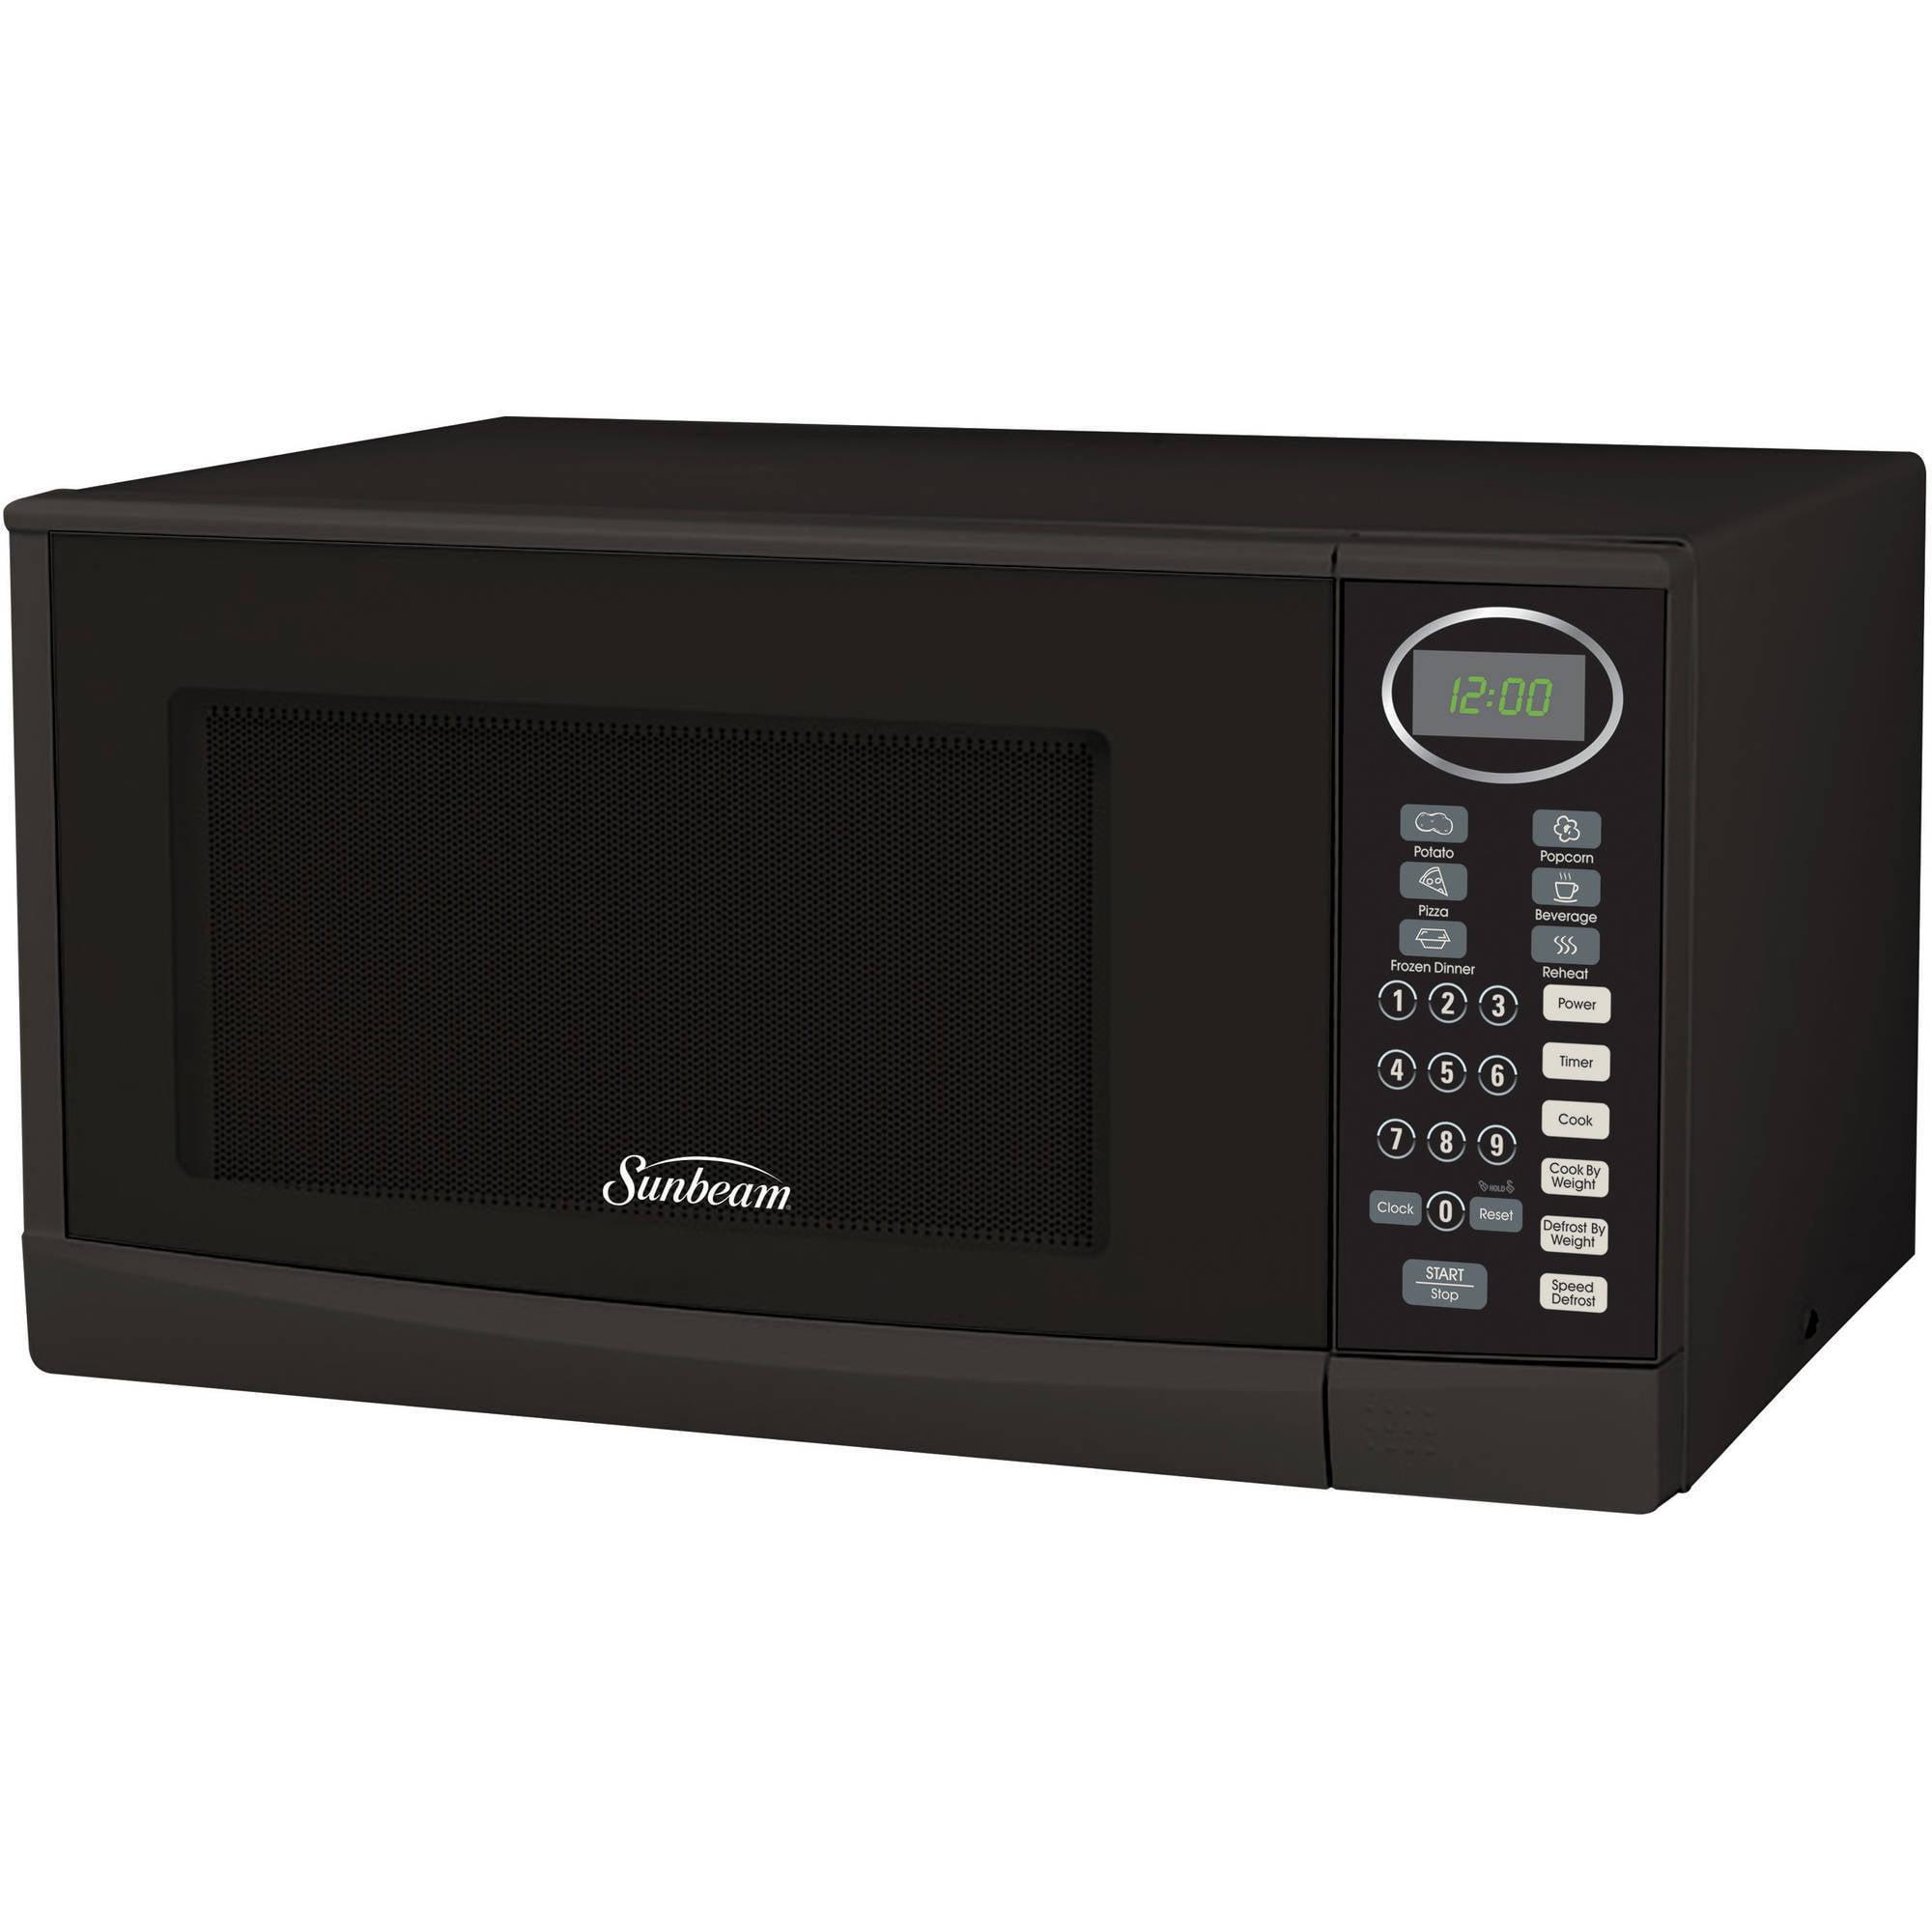 Sunbeam 1 Cu Ft Digital Microwave